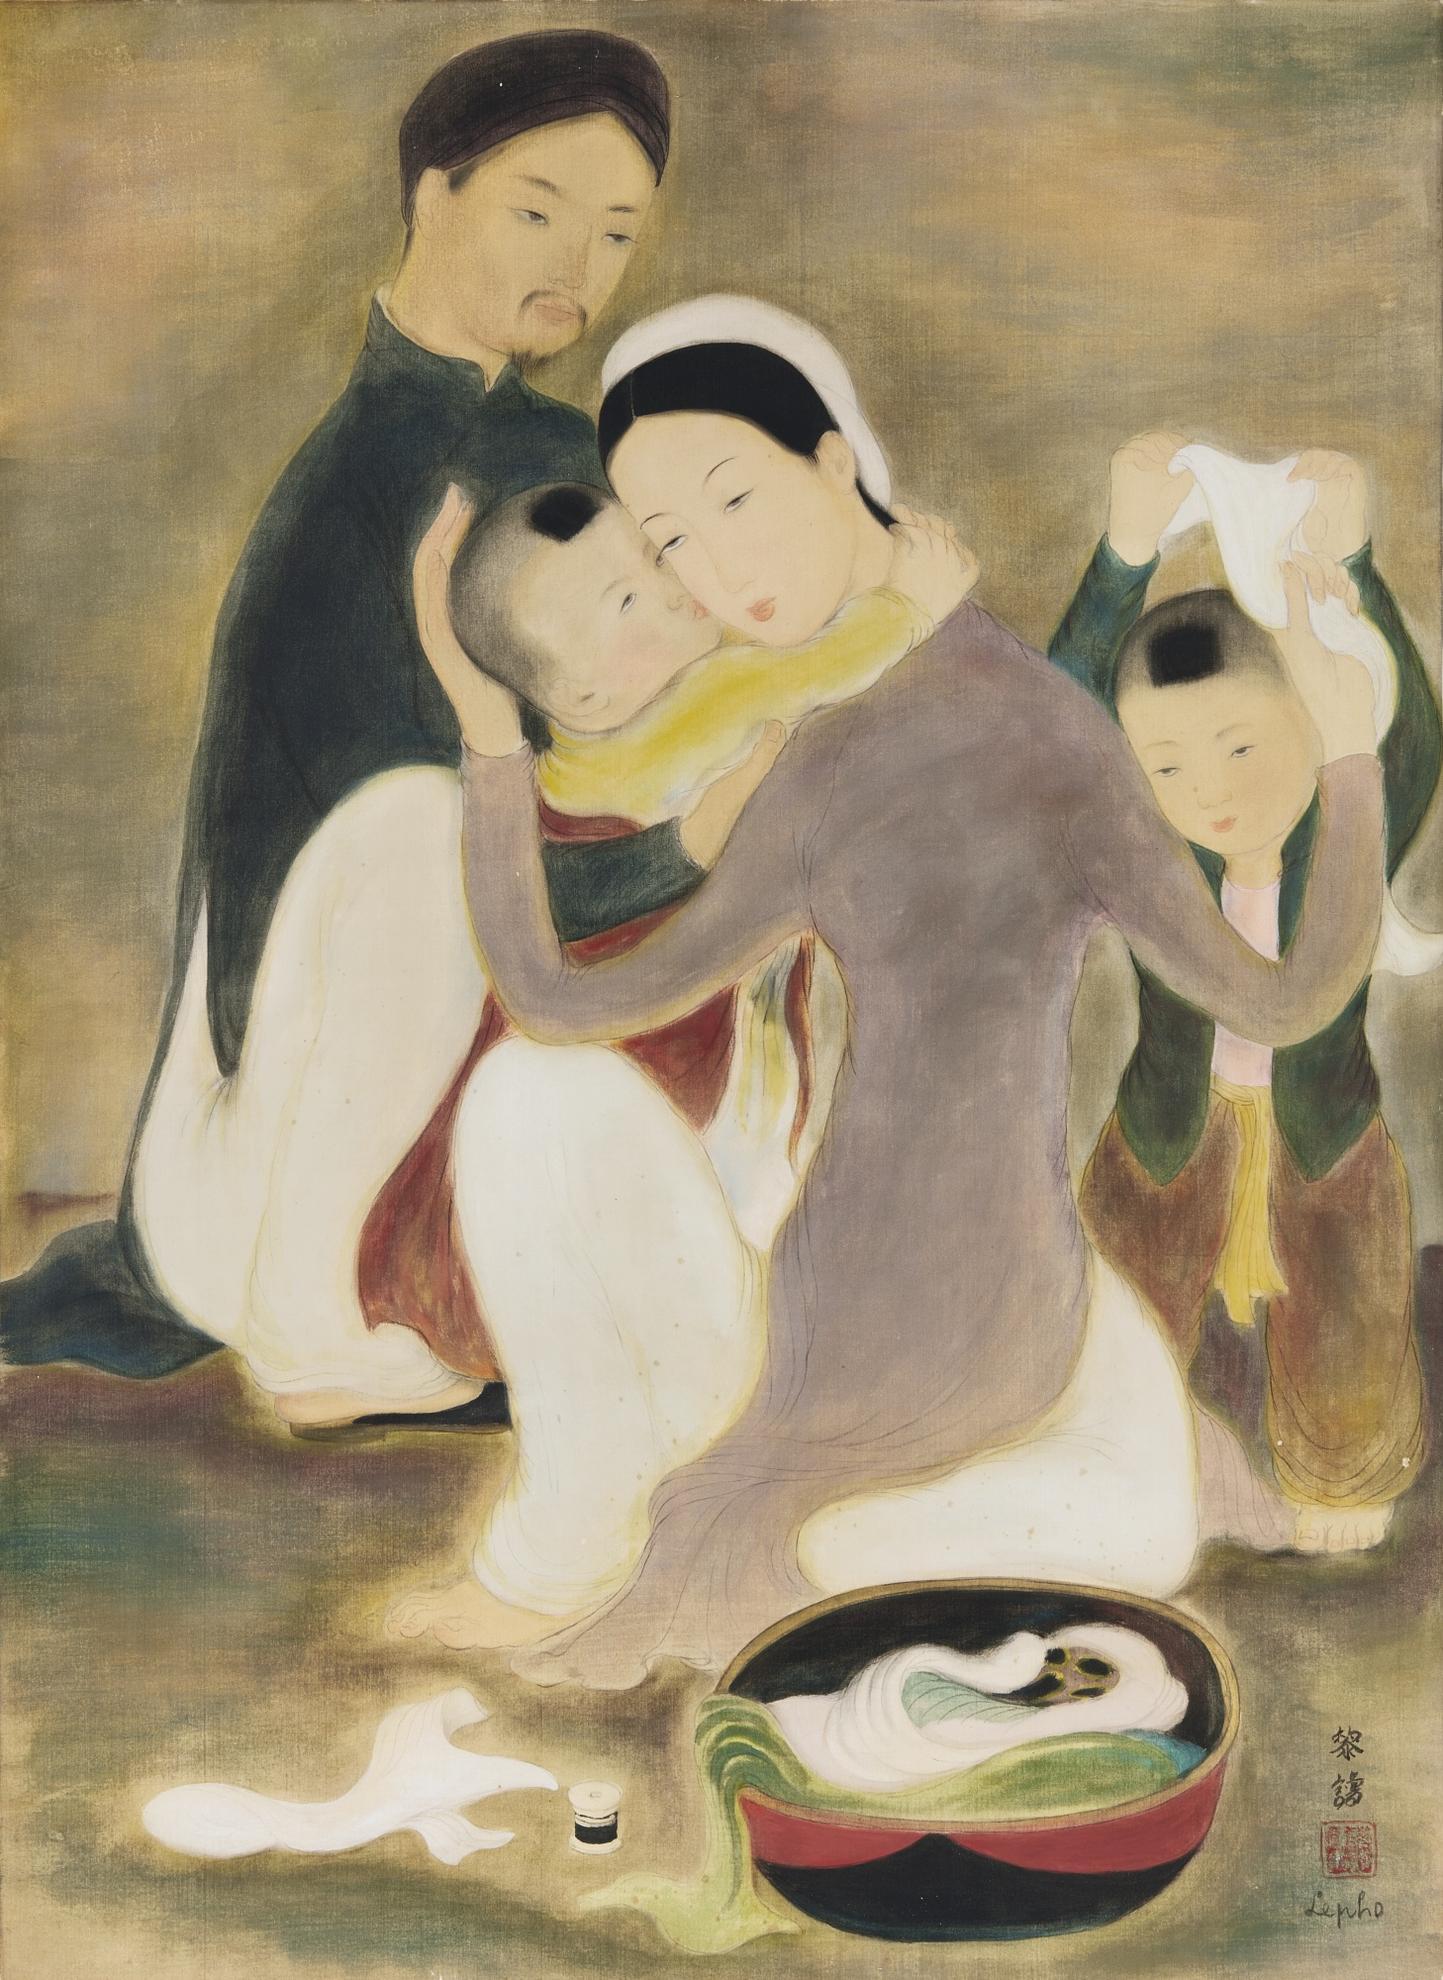 Le Pho-La Famille (The Family)-1940